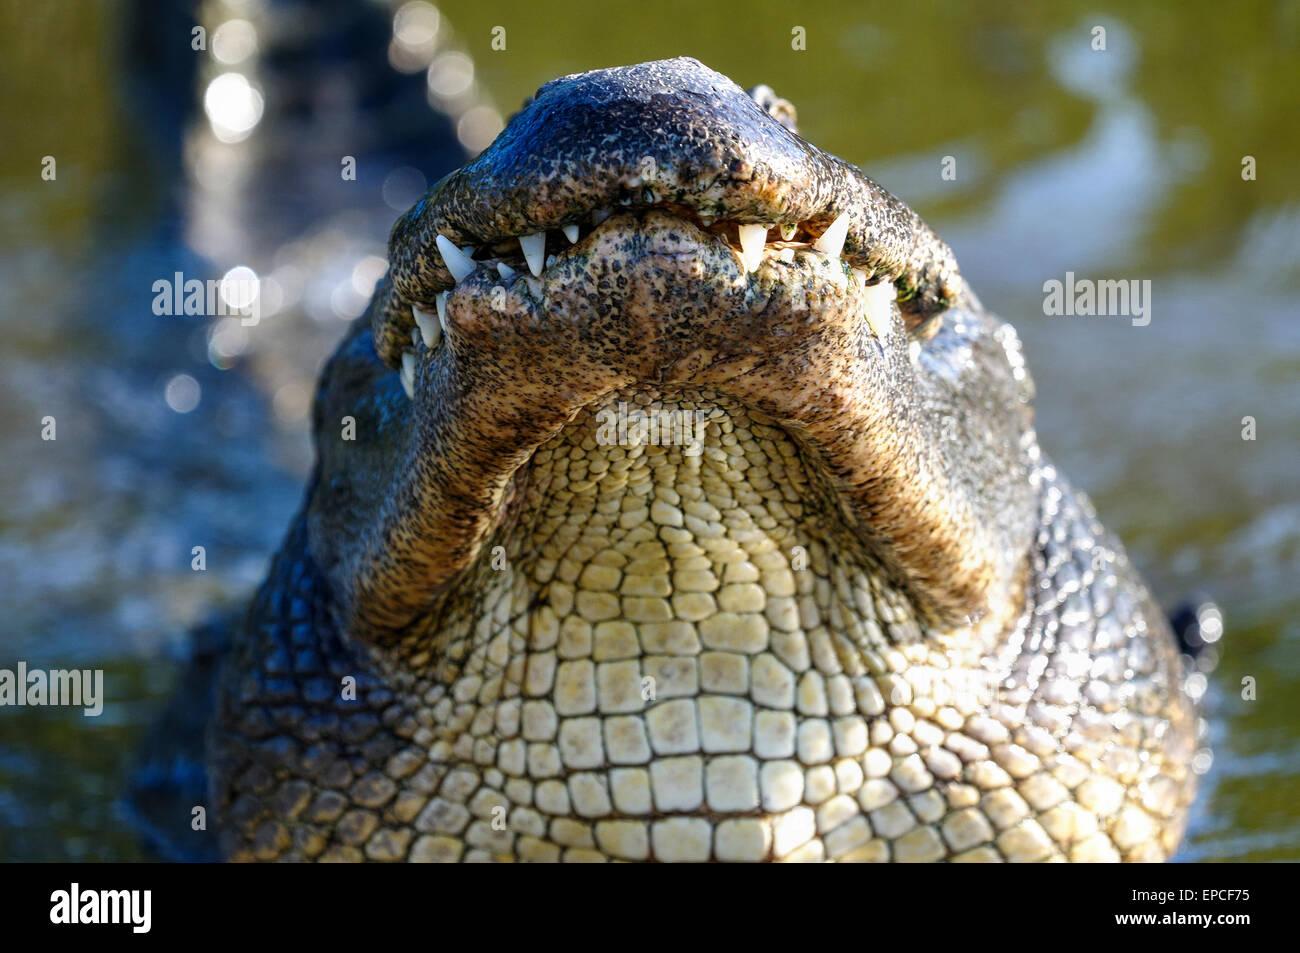 Alligator mississippiensis, cocodrilo americano Imagen De Stock